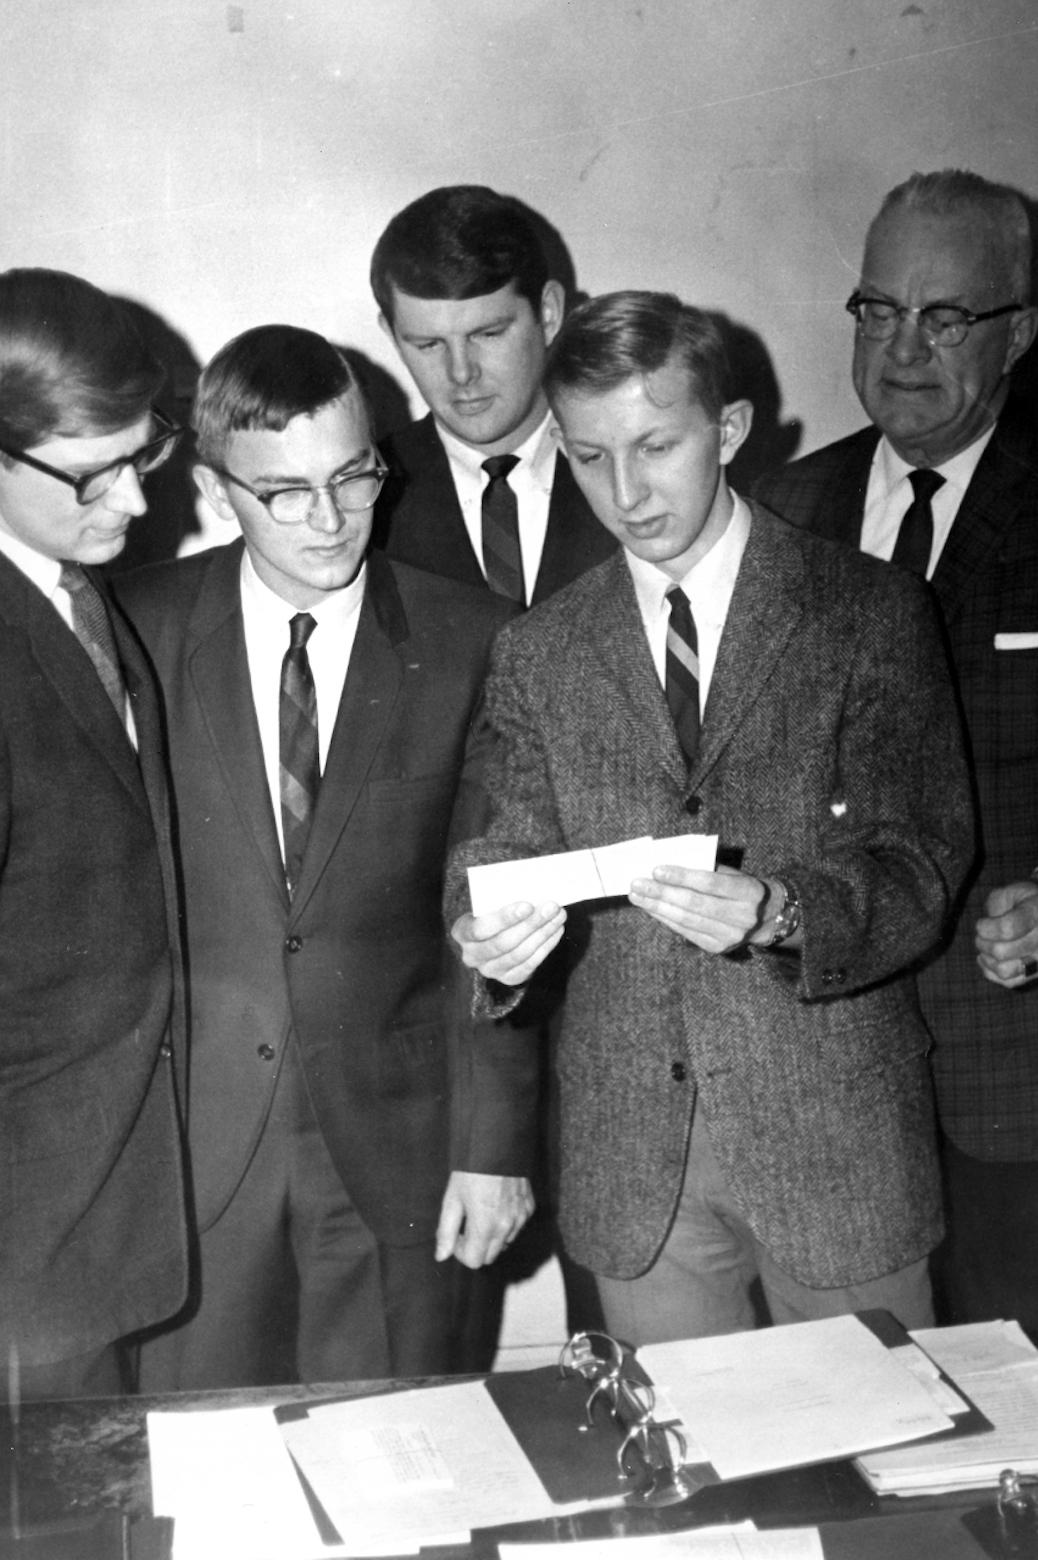 Johnson and his students looking at notecards